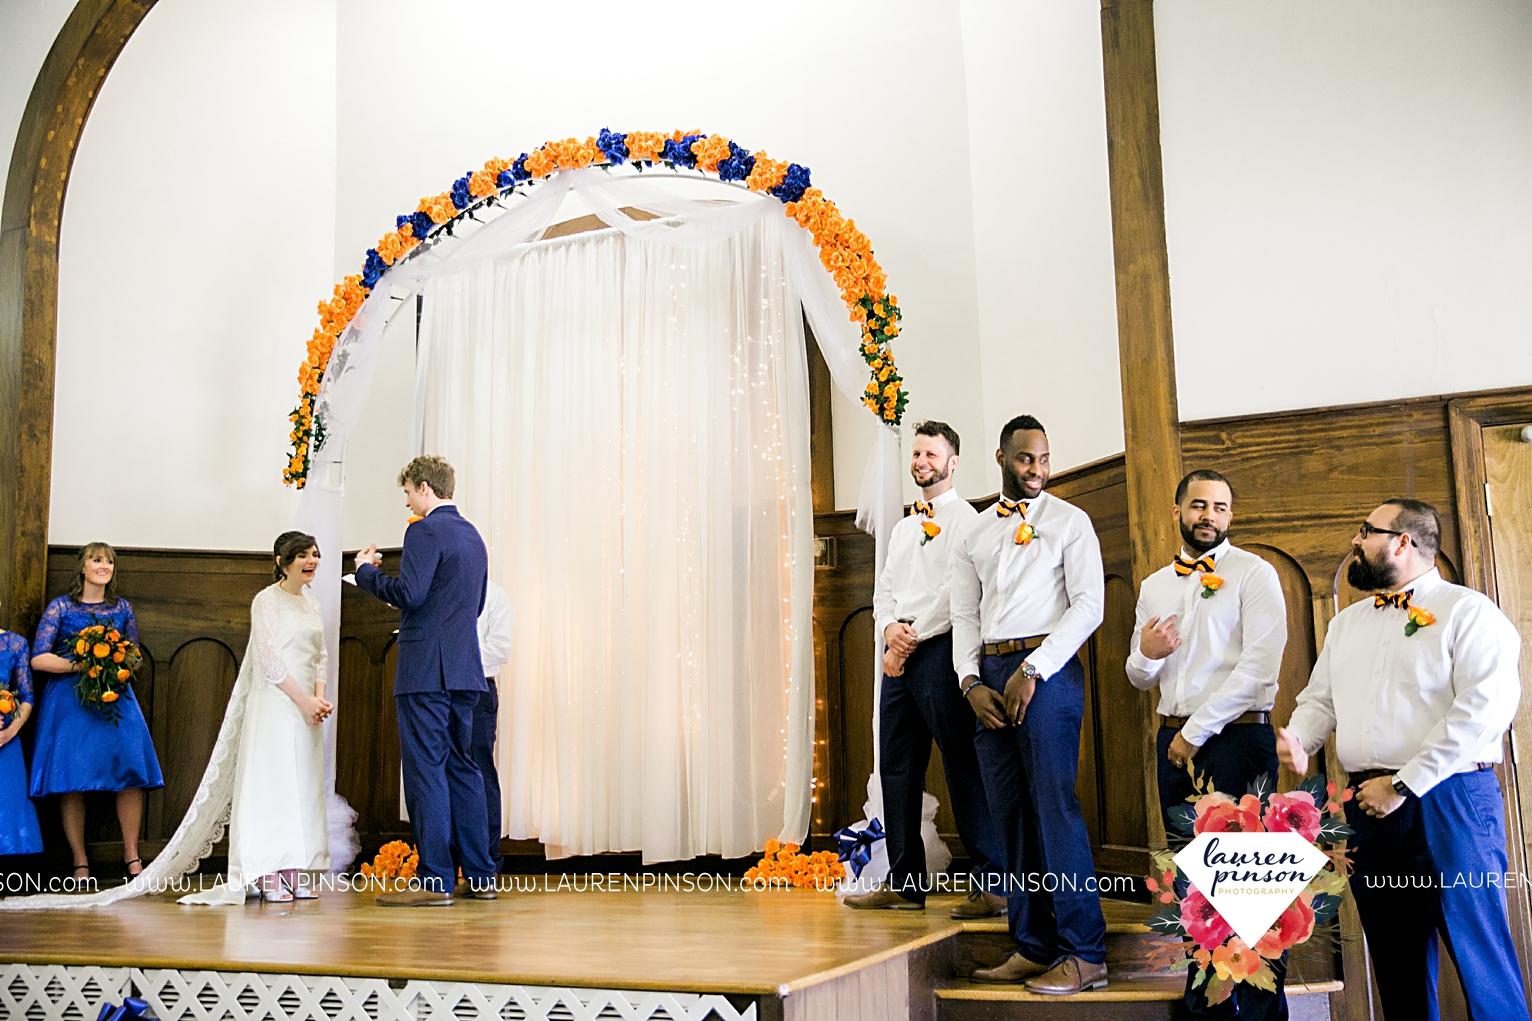 wichita-falls-texas-wedding-photographer-vintage-off-beat-bride-faith-village-church-of-christ-the-plex-roller-skating_2411.jpg